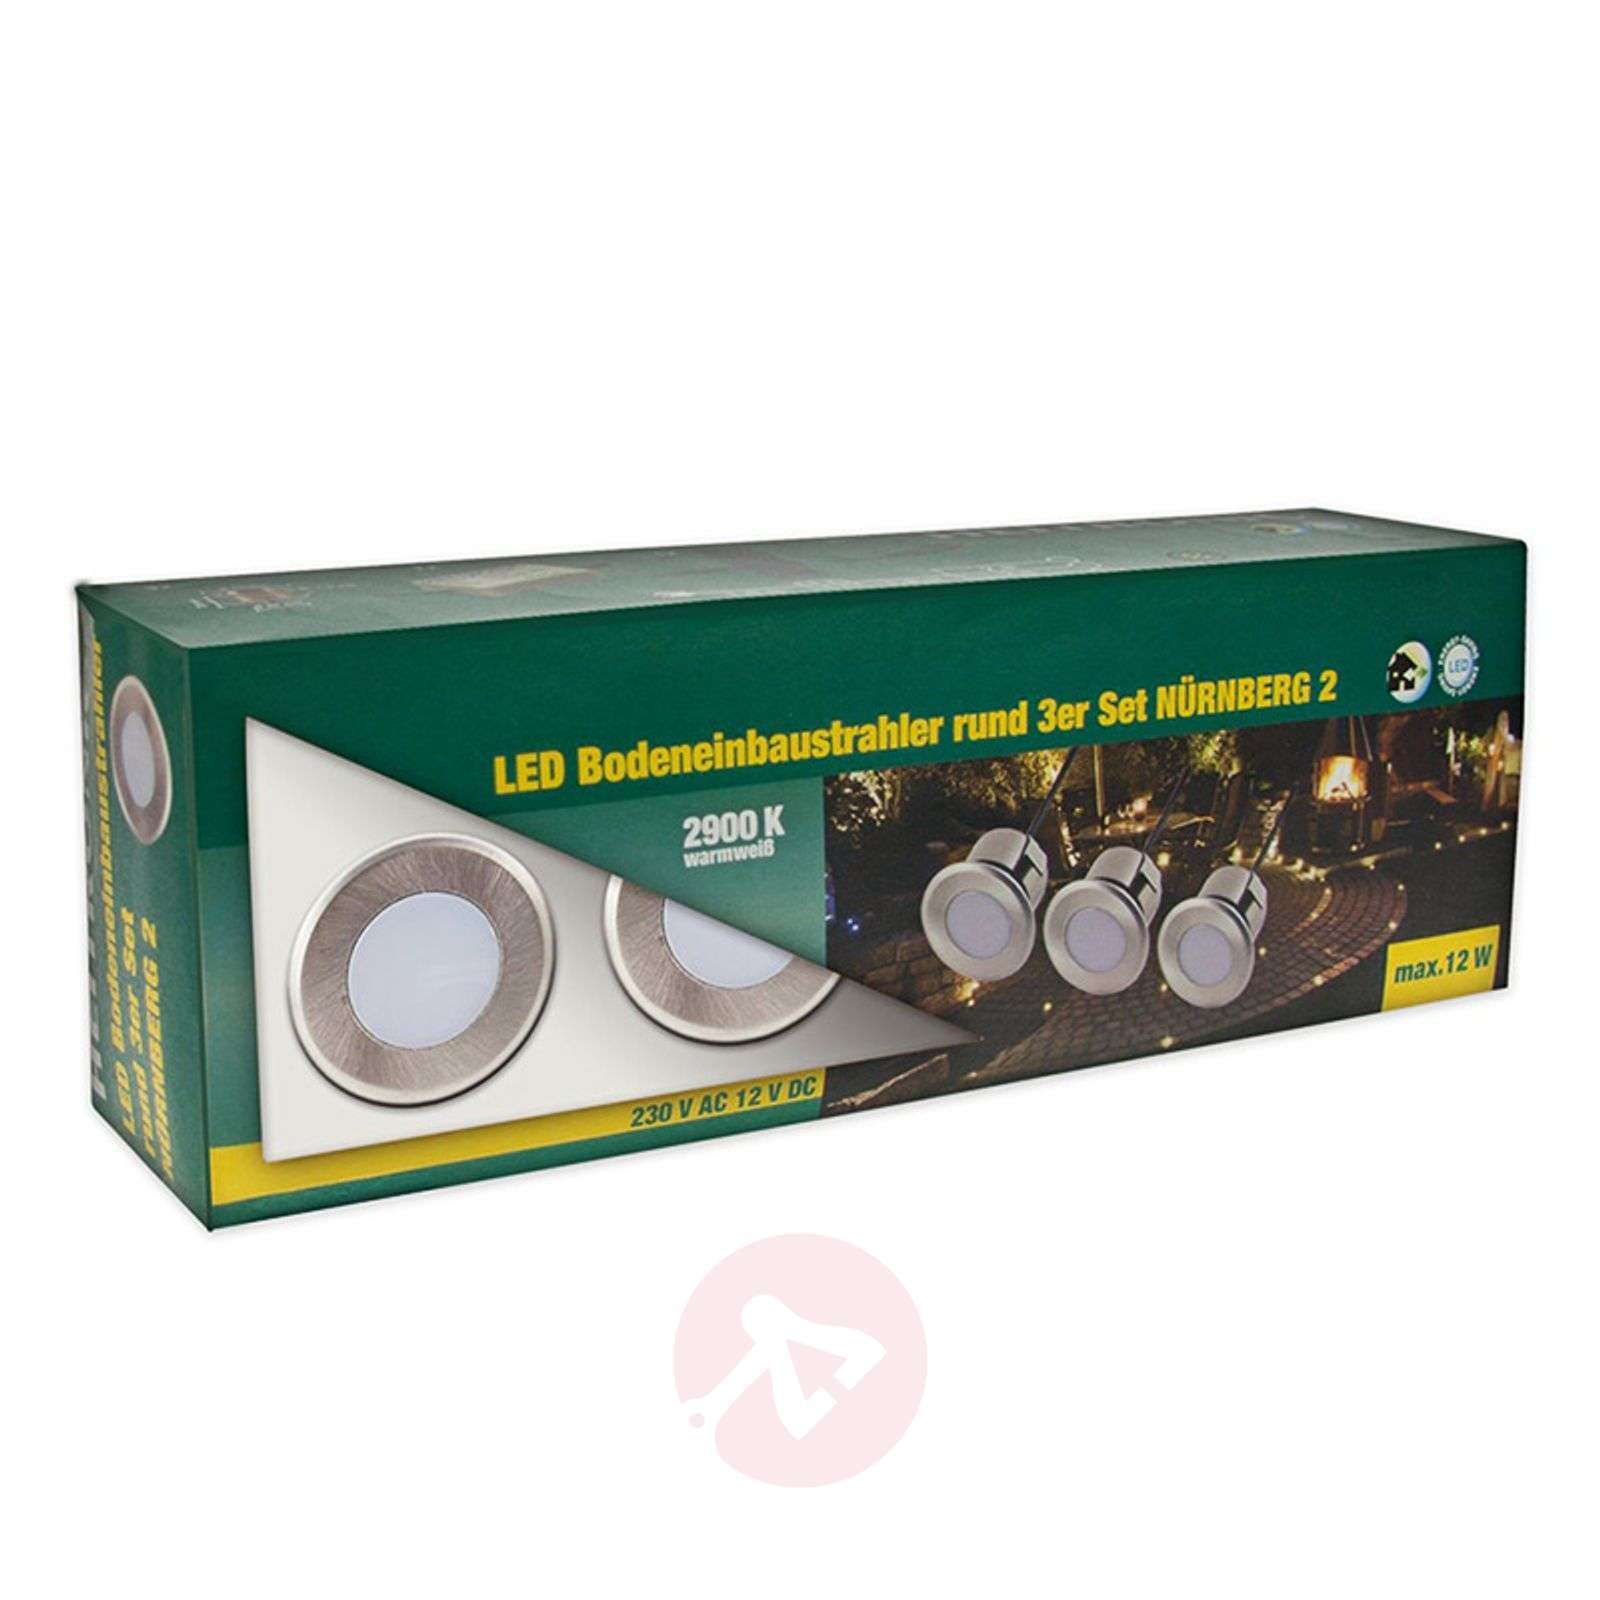 3-sarja LED-uppospotti Nürnberg III, pyöreä-9505881-01